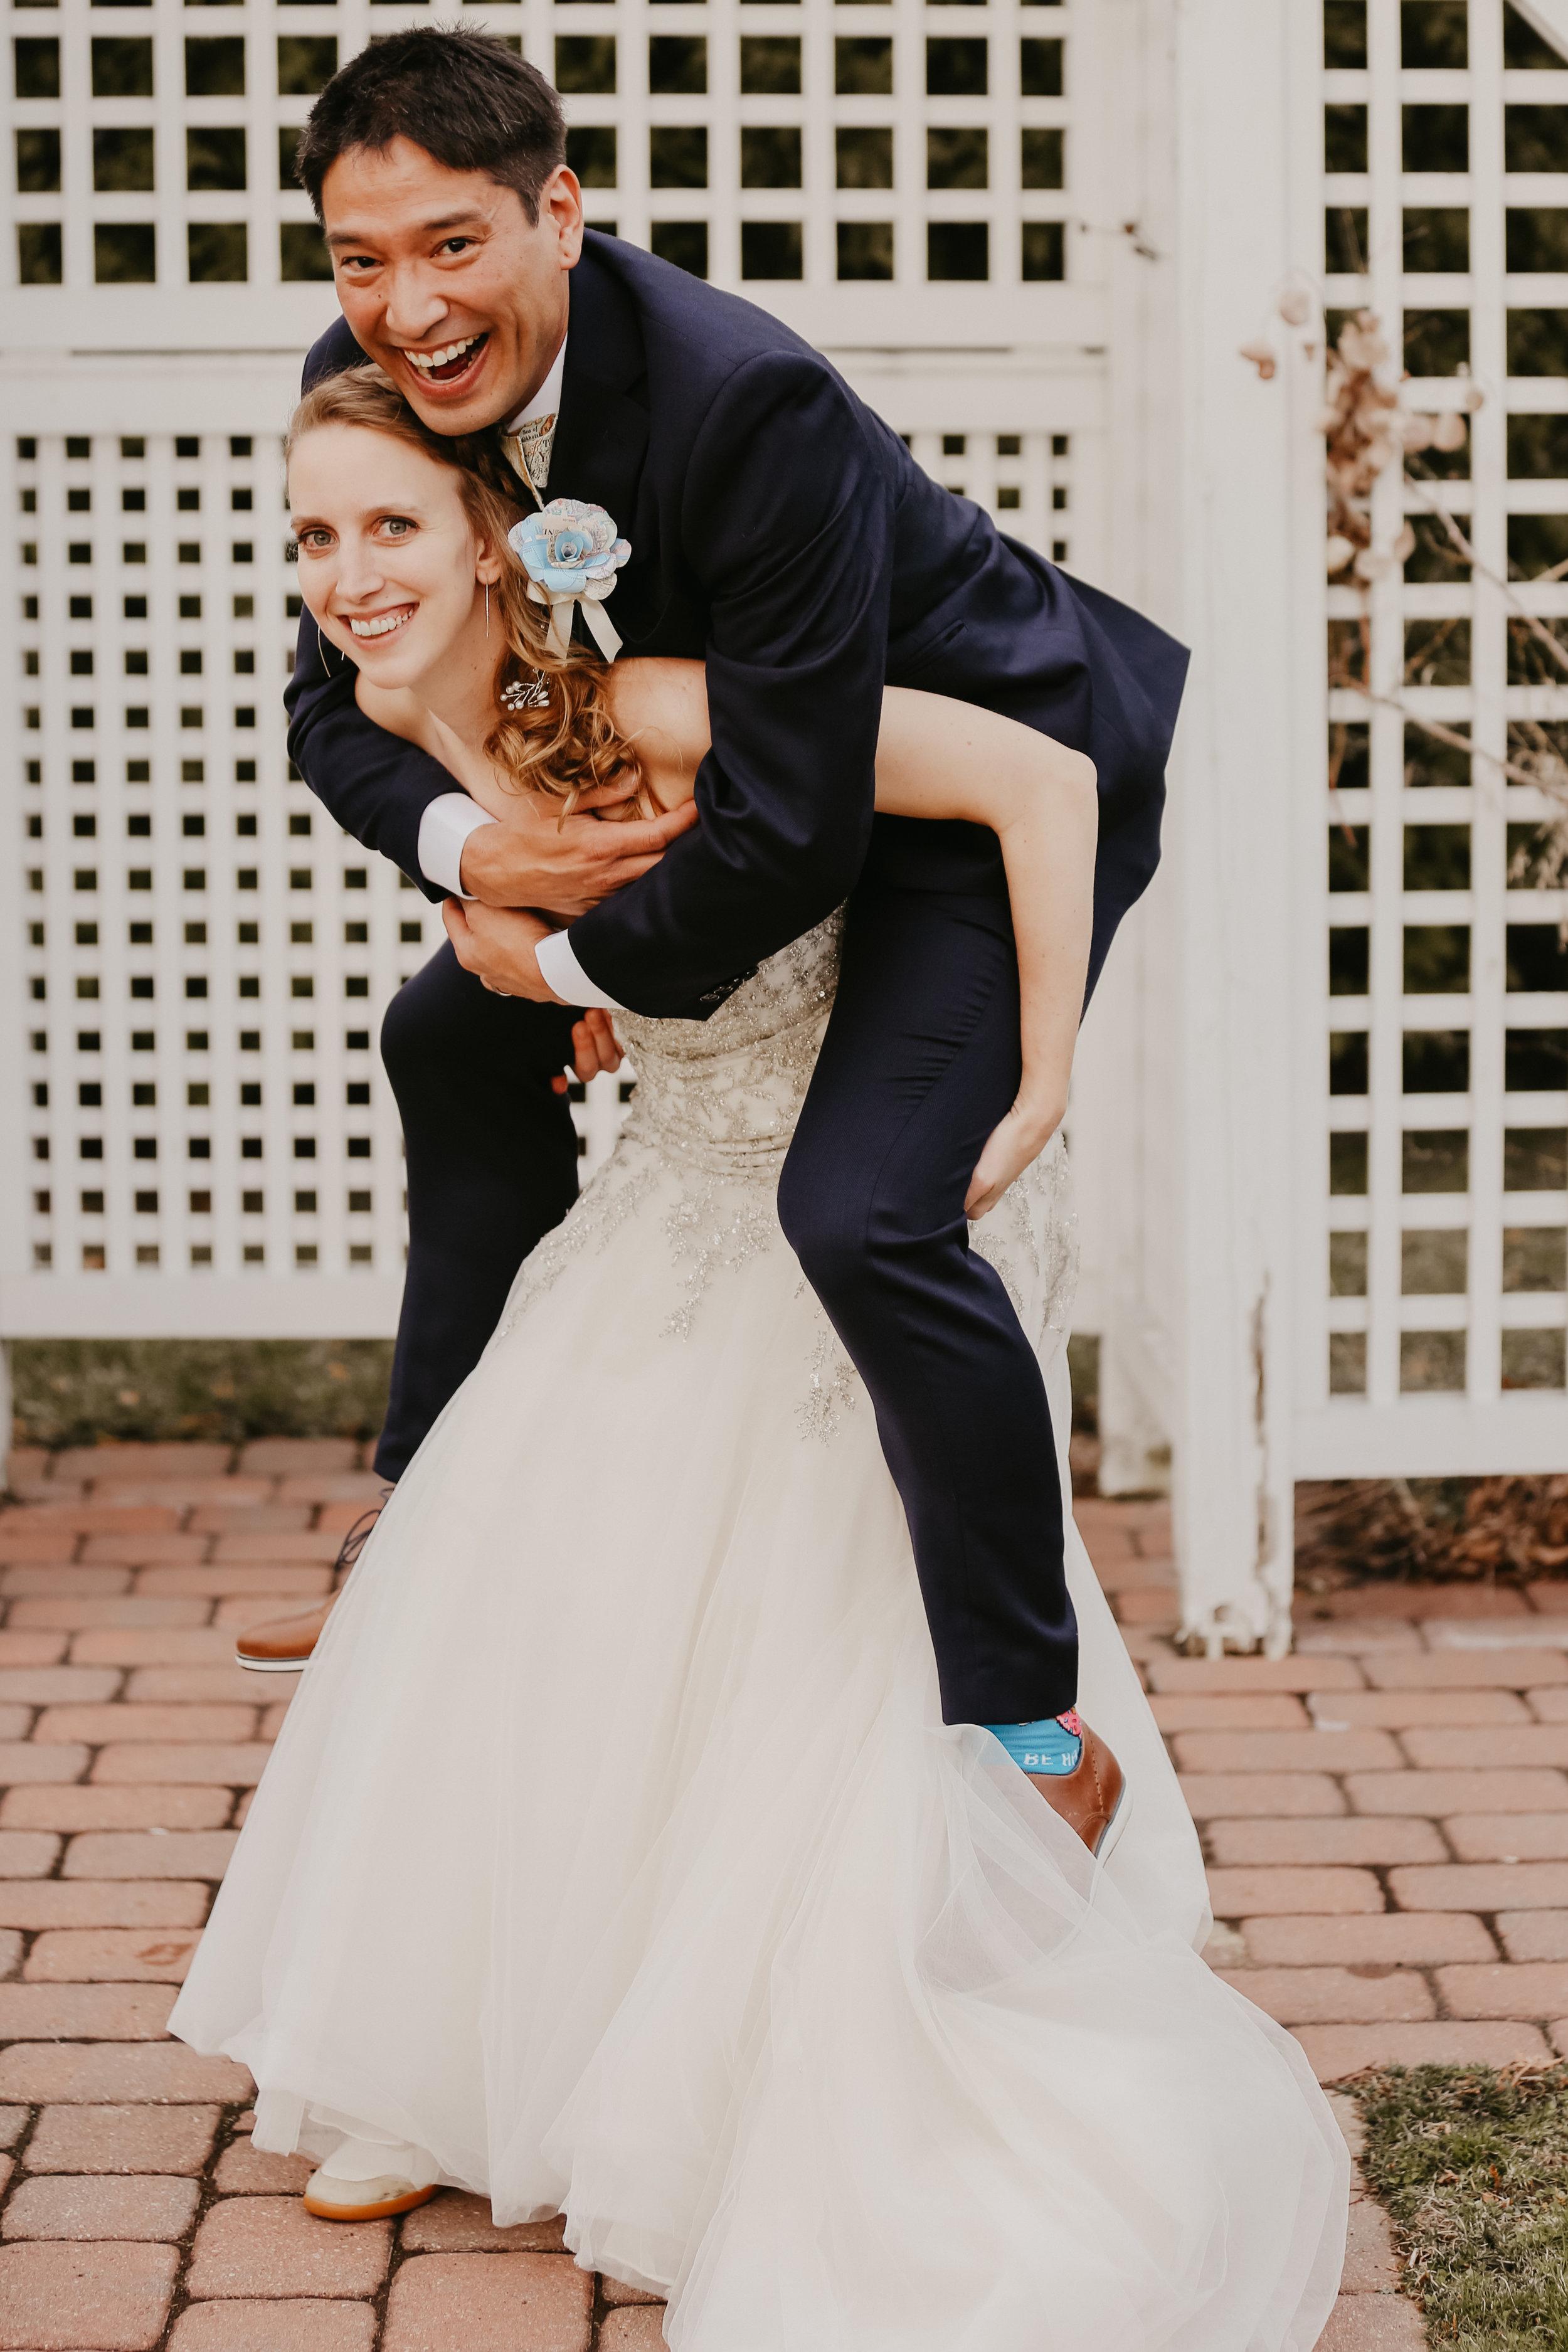 Britt-George-Wedding-Groveland-Fairways-Ruby-Jean-Photography-248.jpg